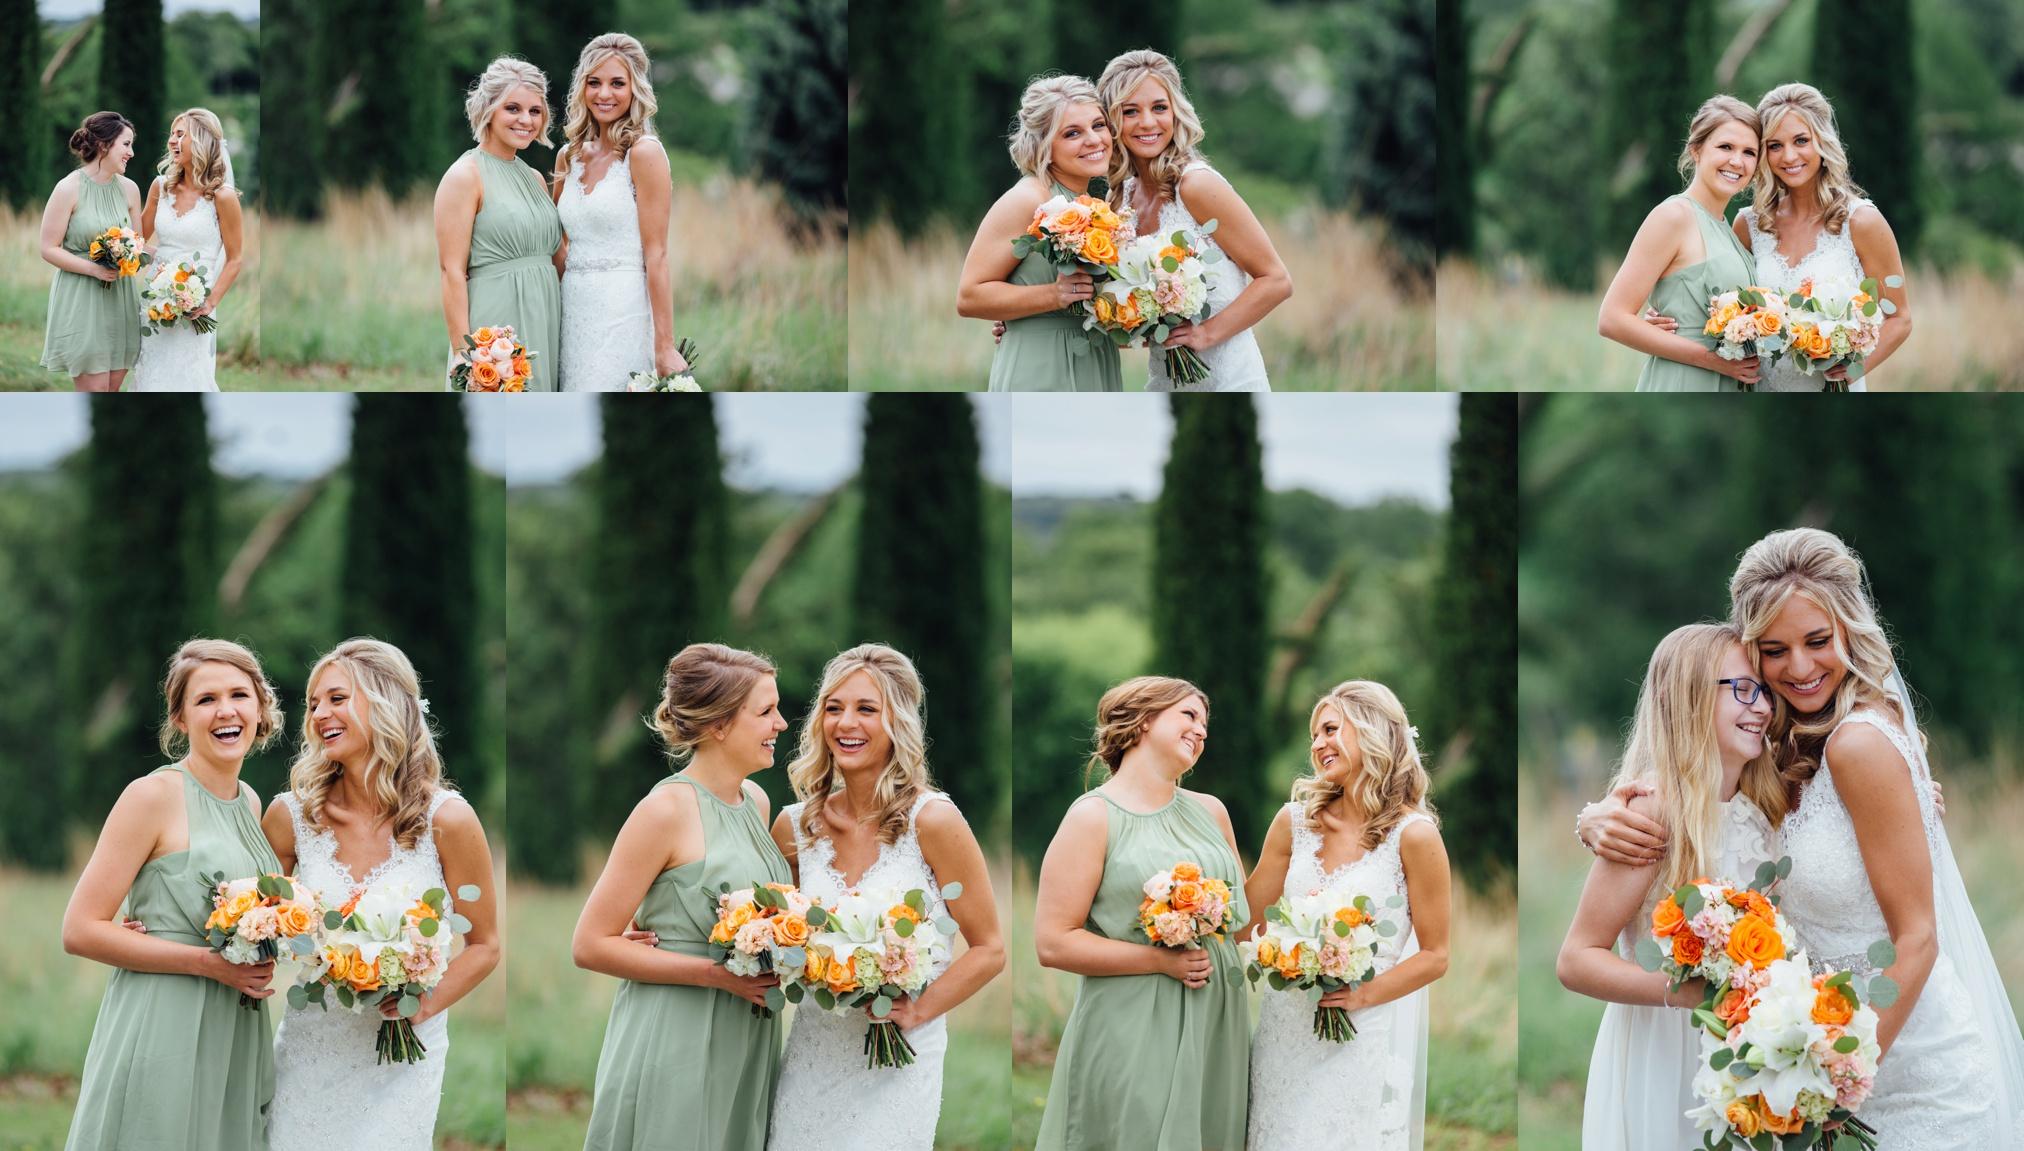 schmid_wedding-150.jpg